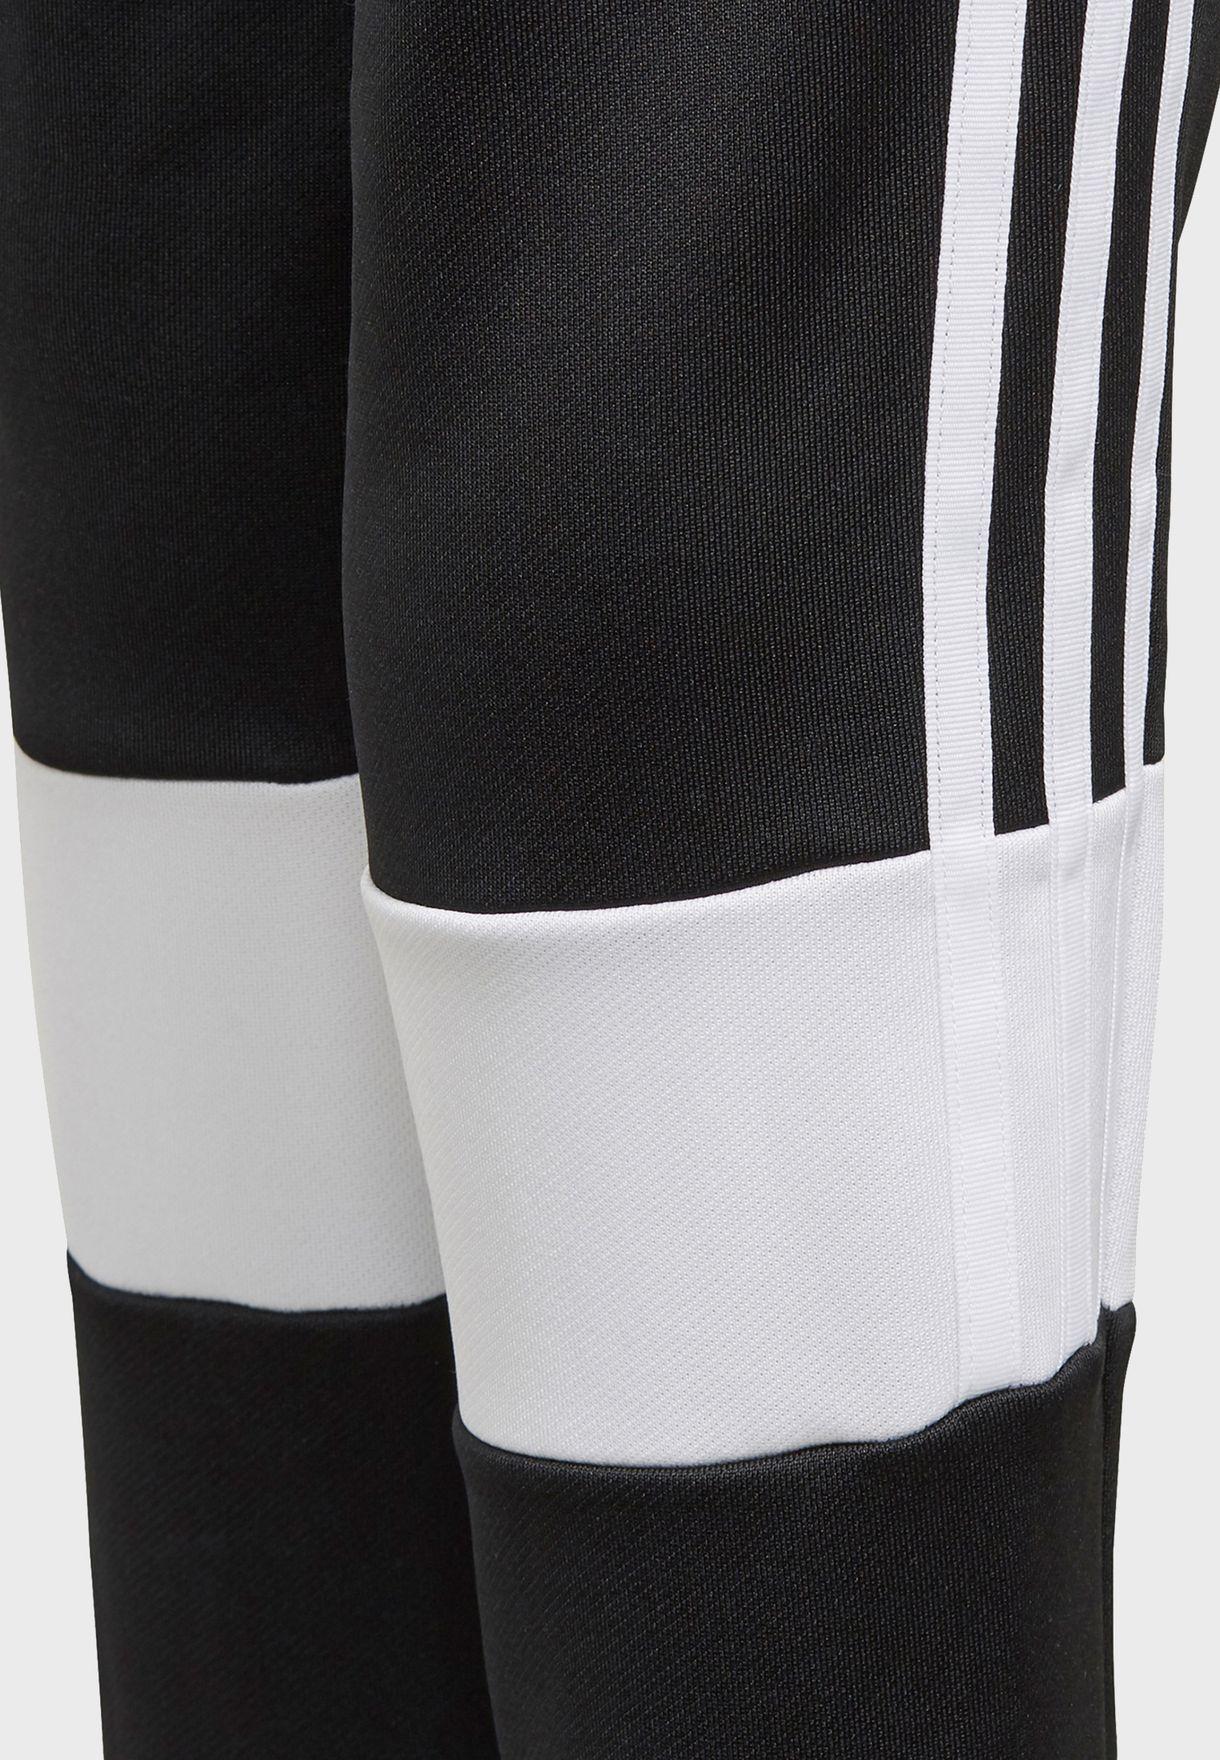 Youth Aero Ready 3 Stripe Sweatpants